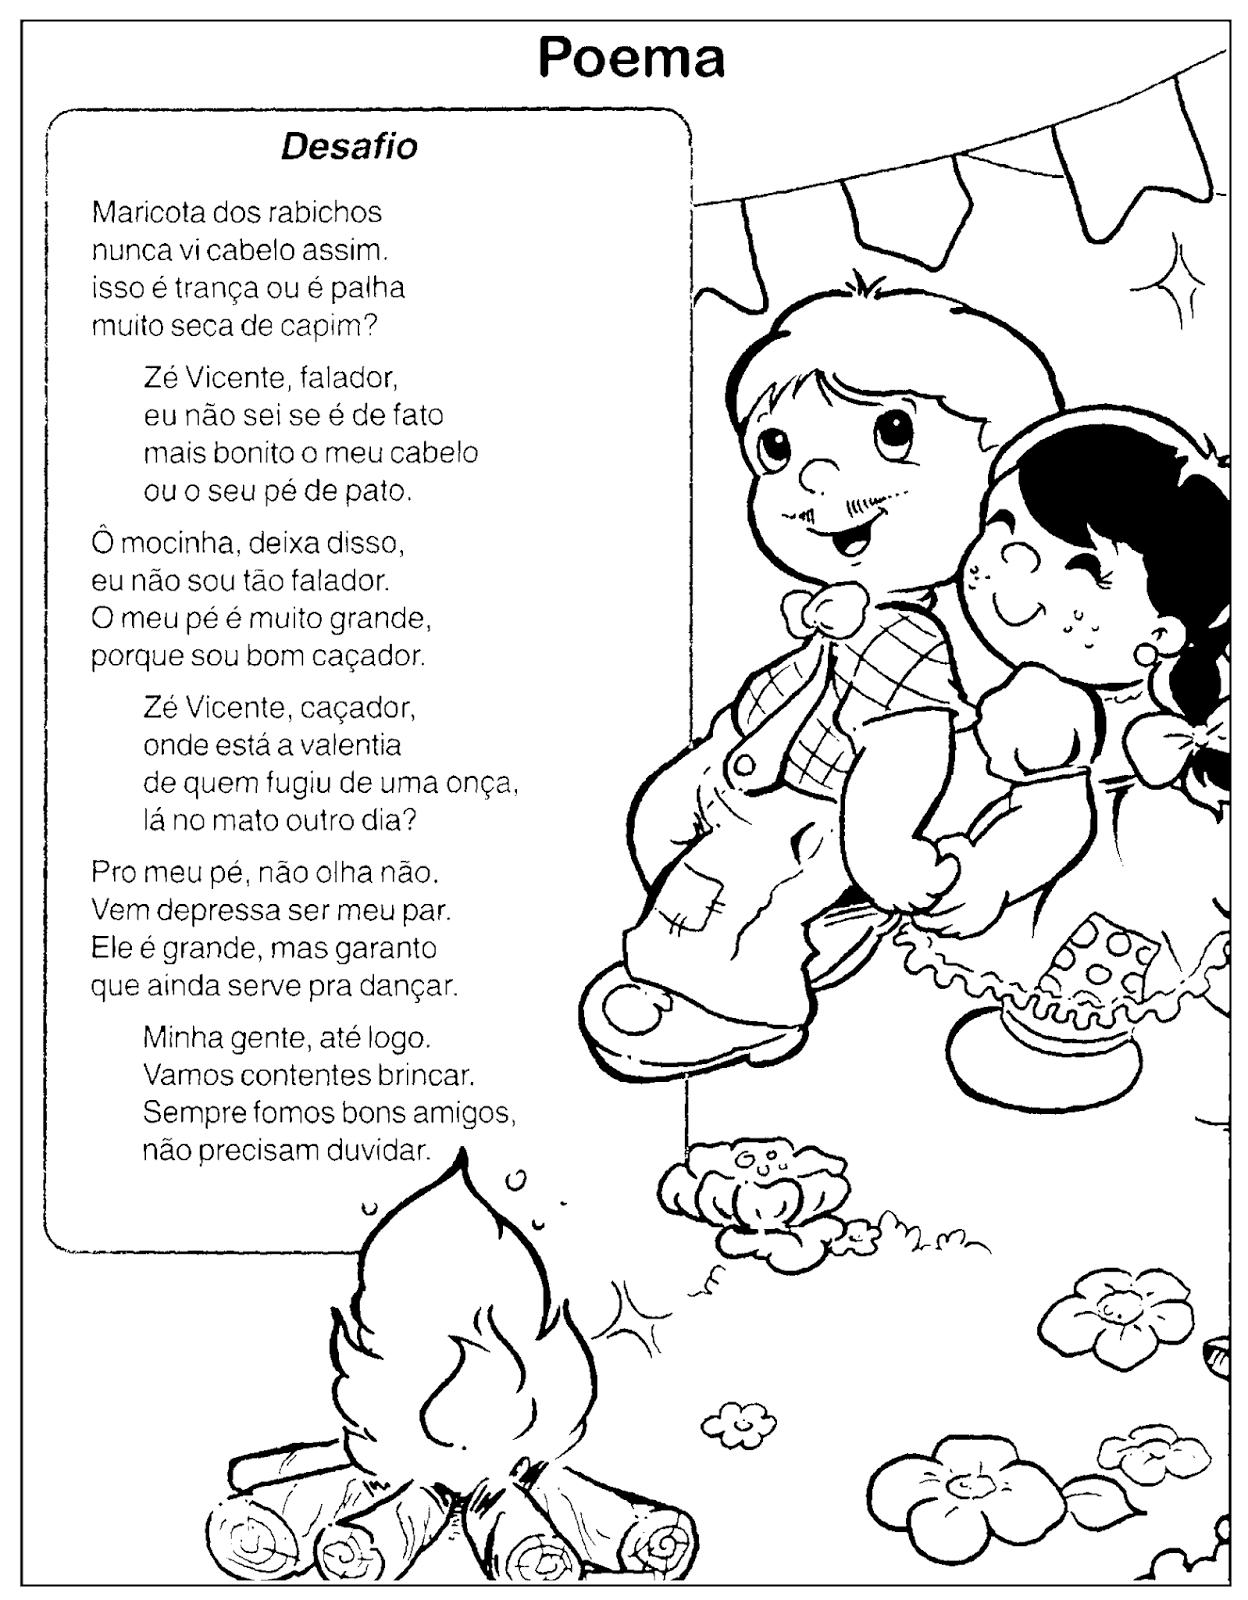 Poemas Sobre Festa Junina Com Desenhos Para Colorir So Escola